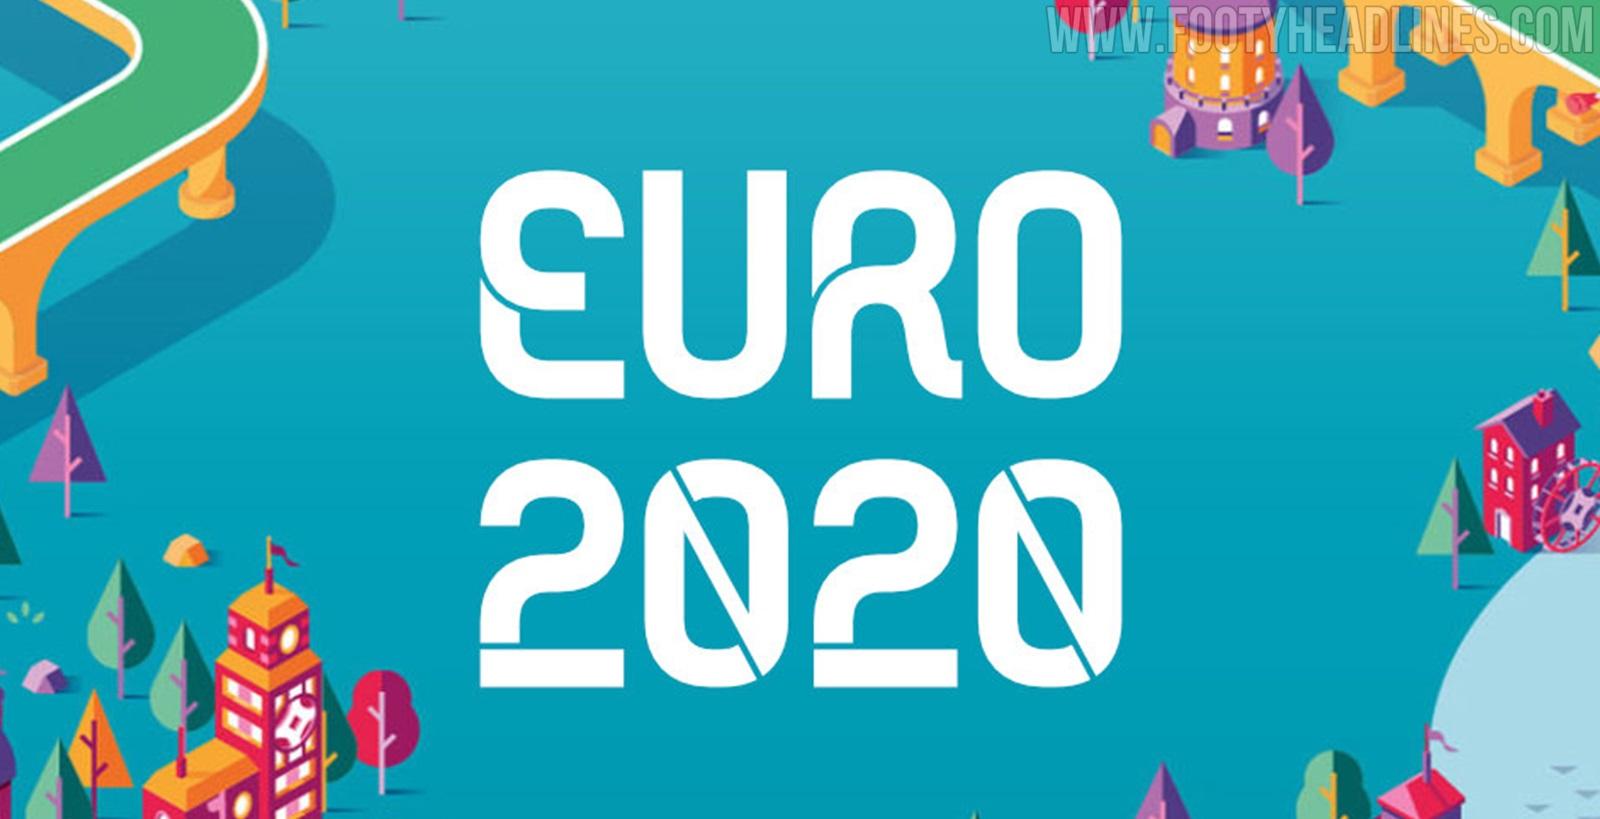 uefa euro 2020 - photo #21